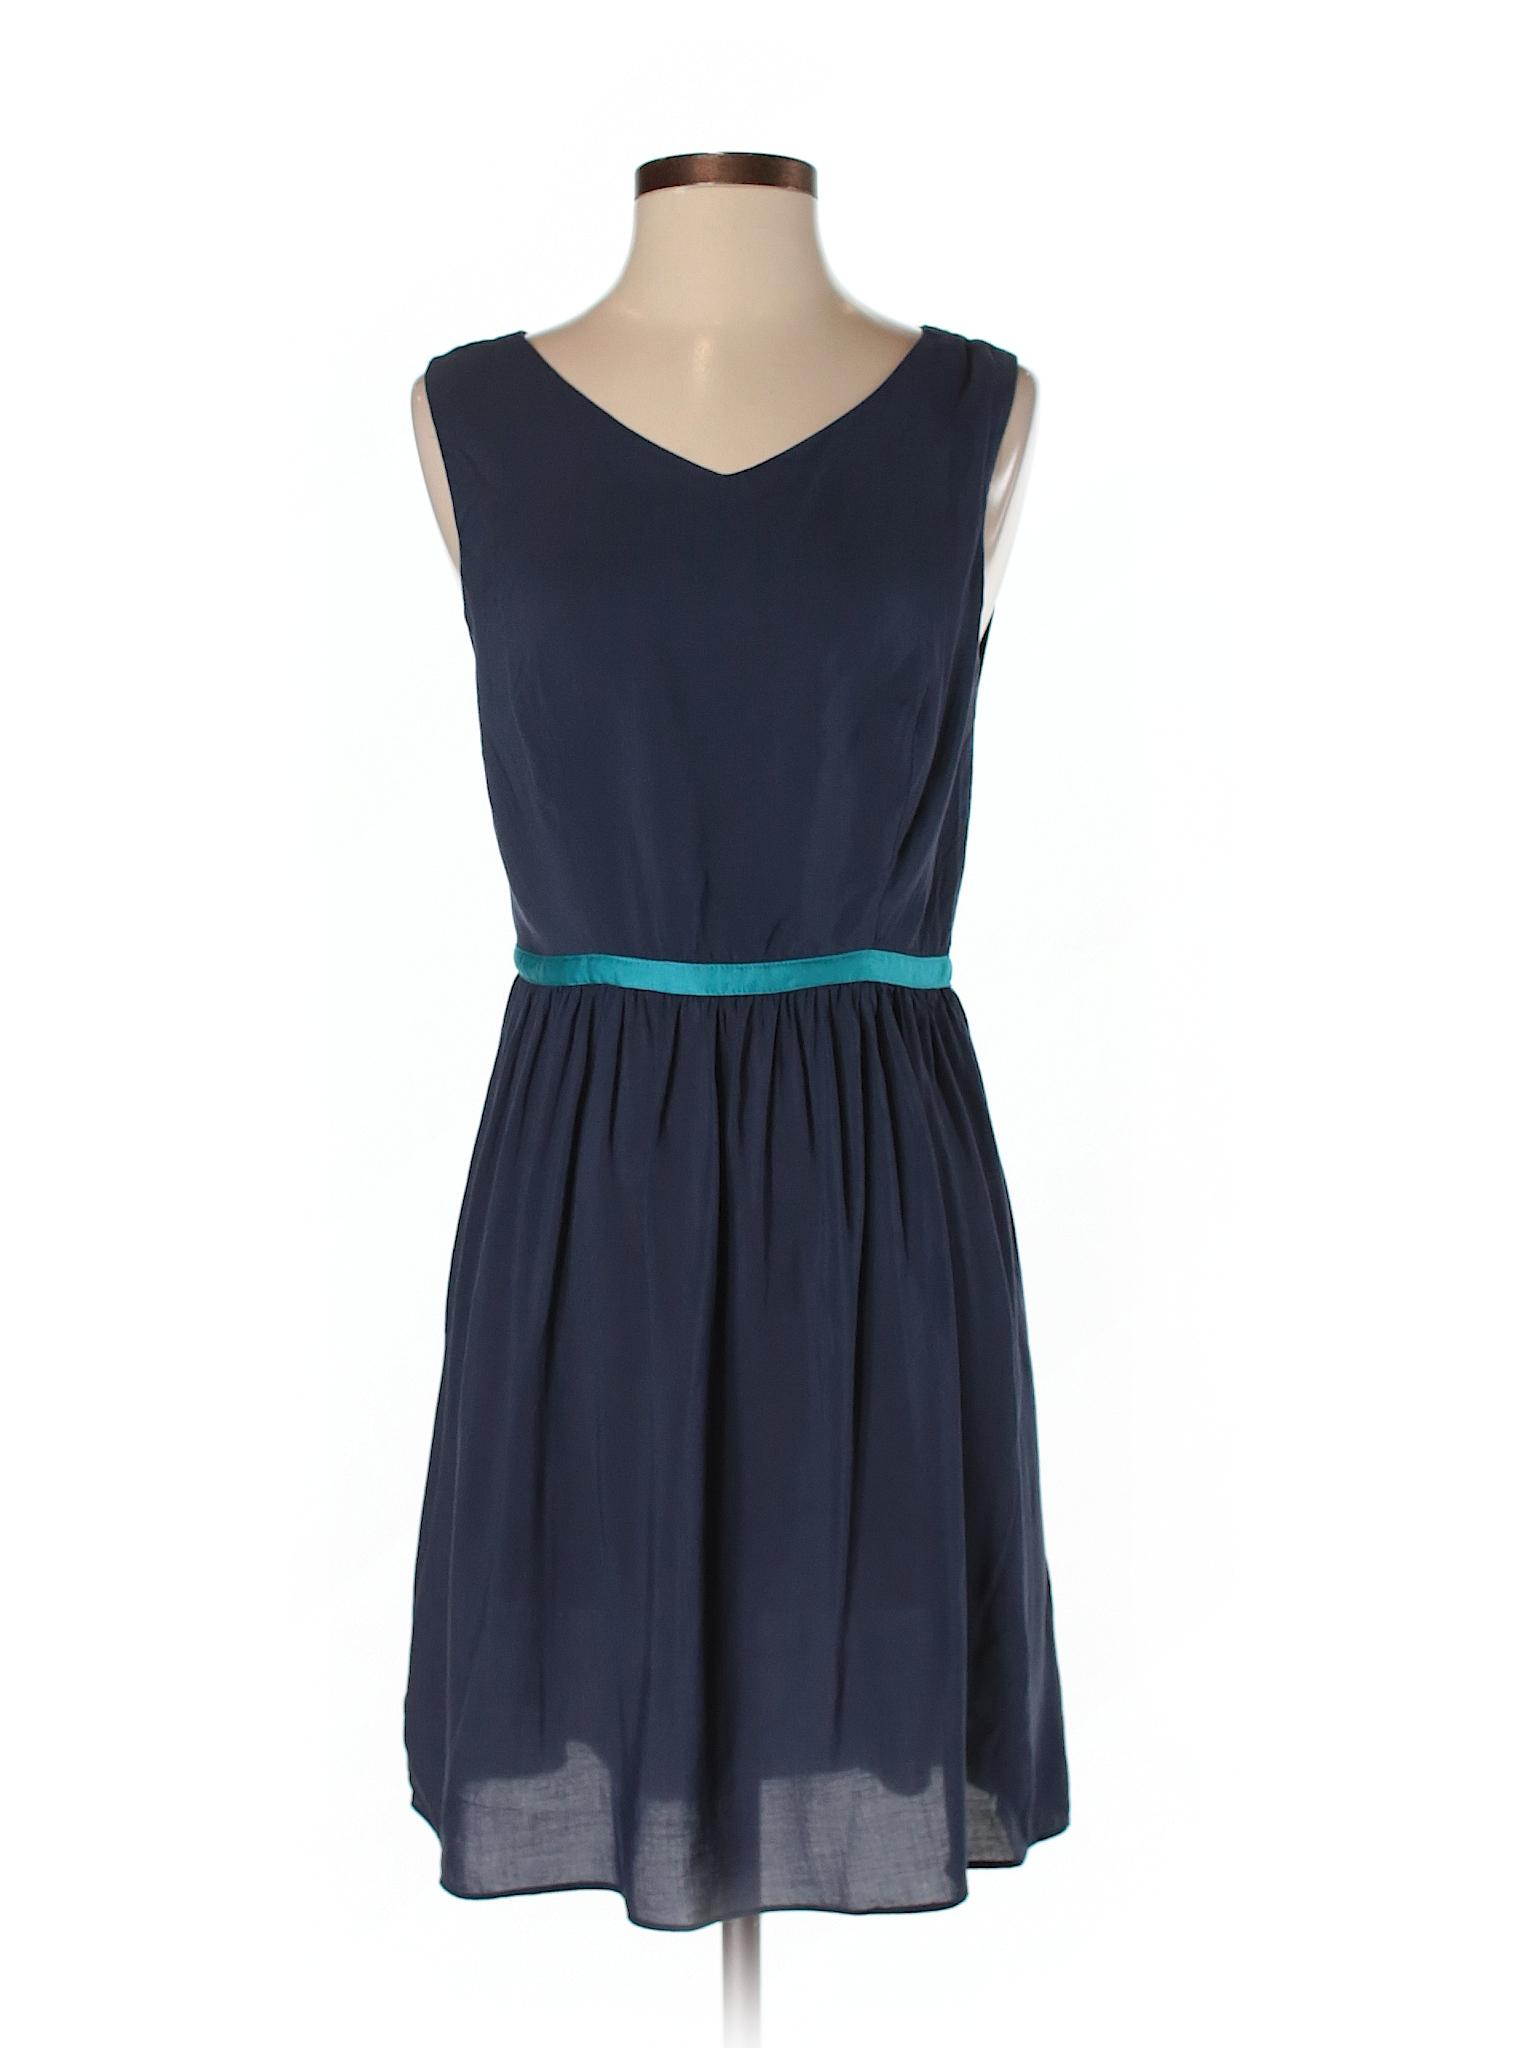 Buttons Selling Dress Buttons Buttons Buttons Casual Selling Casual Selling Dress Dress Selling Casual Ew4wqp6Z